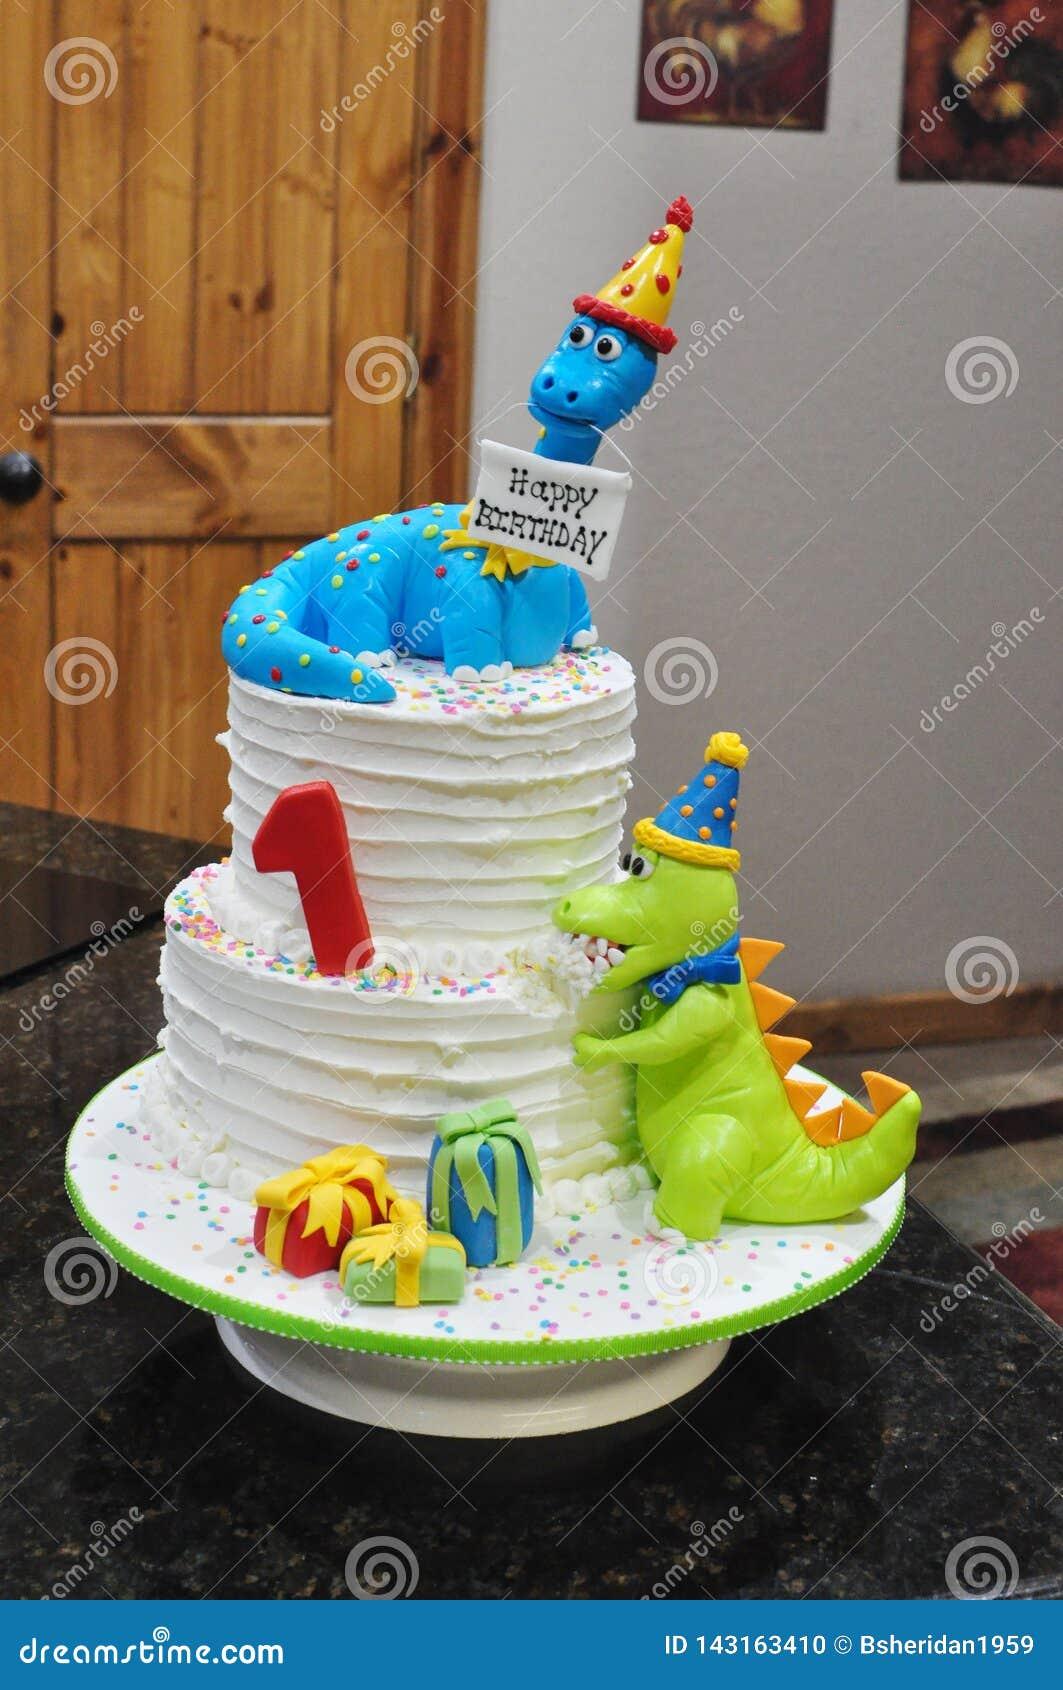 Superb Child S Dinosaur Birthday Cake Stock Photo Image Of Baked Personalised Birthday Cards Paralily Jamesorg